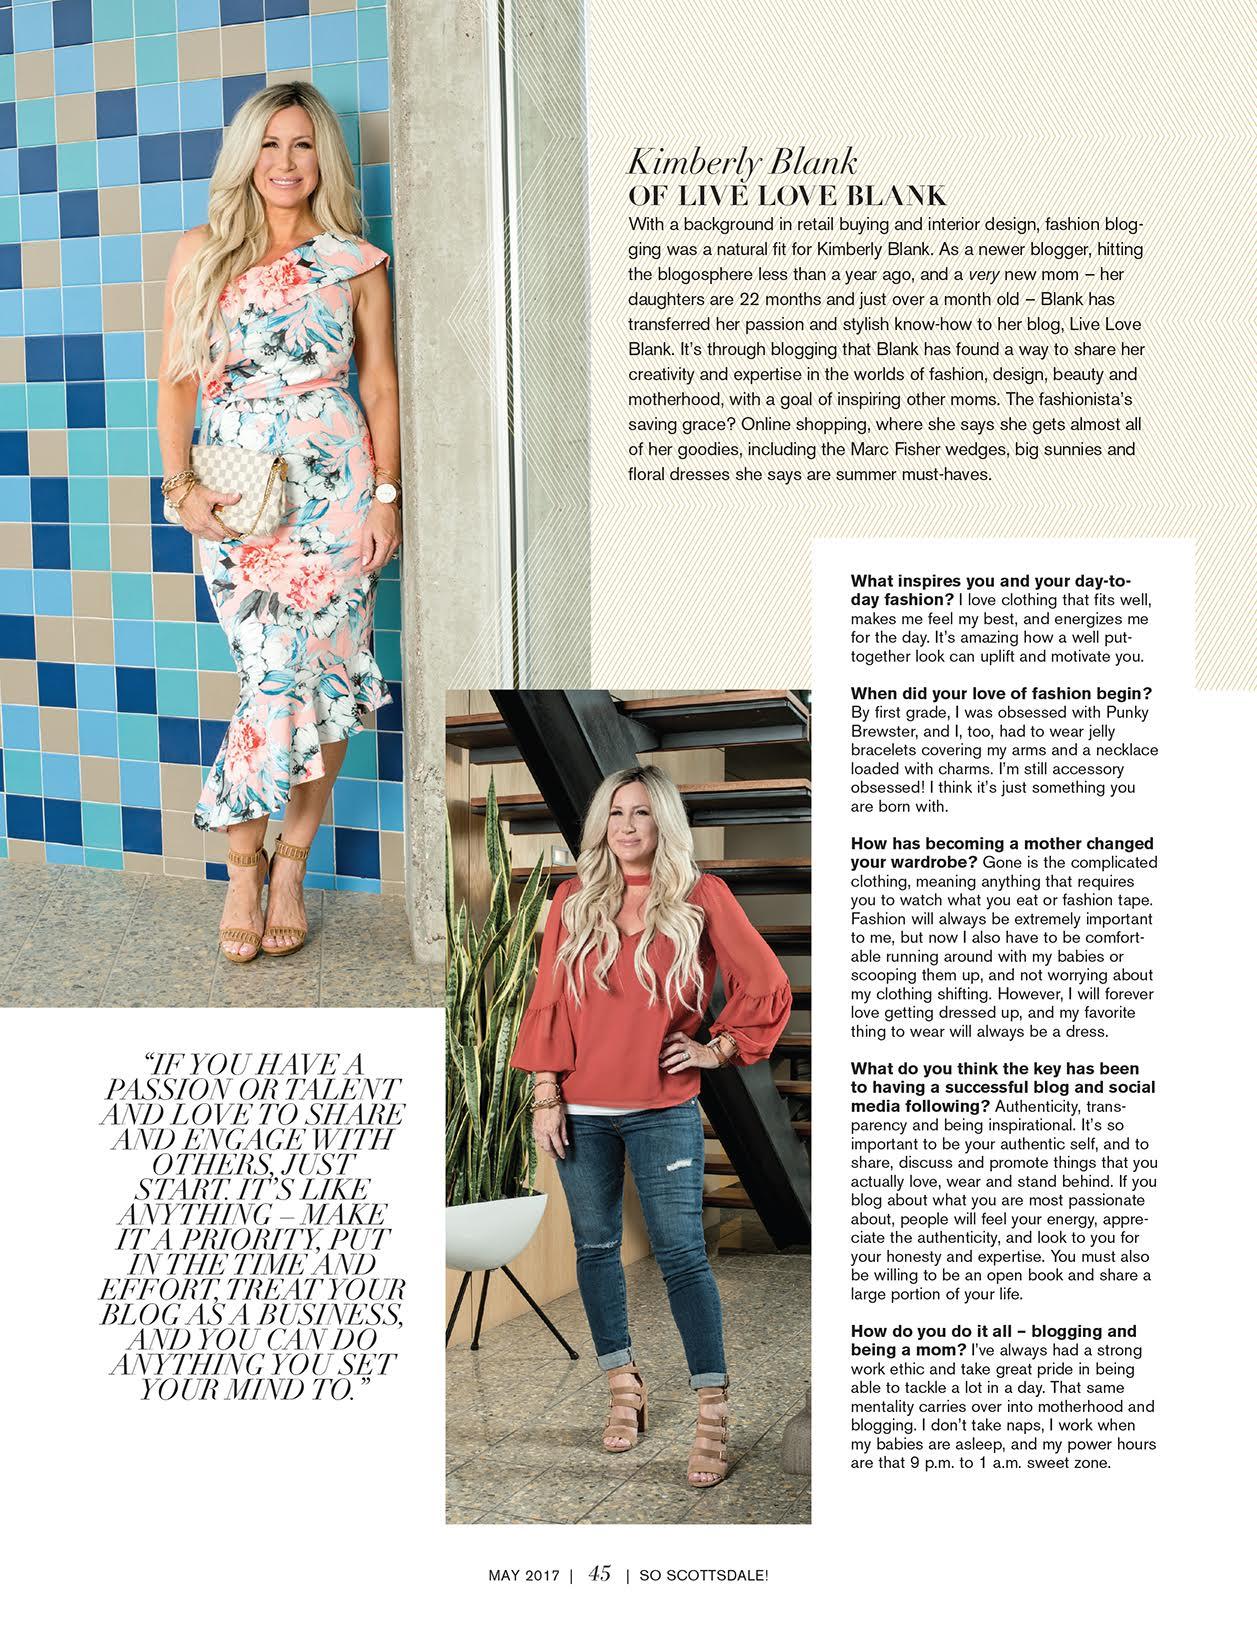 Live Love Blank, So Scottsdale Magazine, Five Moms Who Rule the Fashion Blogosphere, Fashion Blogger, Style Blogger, Lifestyle Blogger, Mom Goals, Mom blogger, Phoenix Scottsdale Arizona